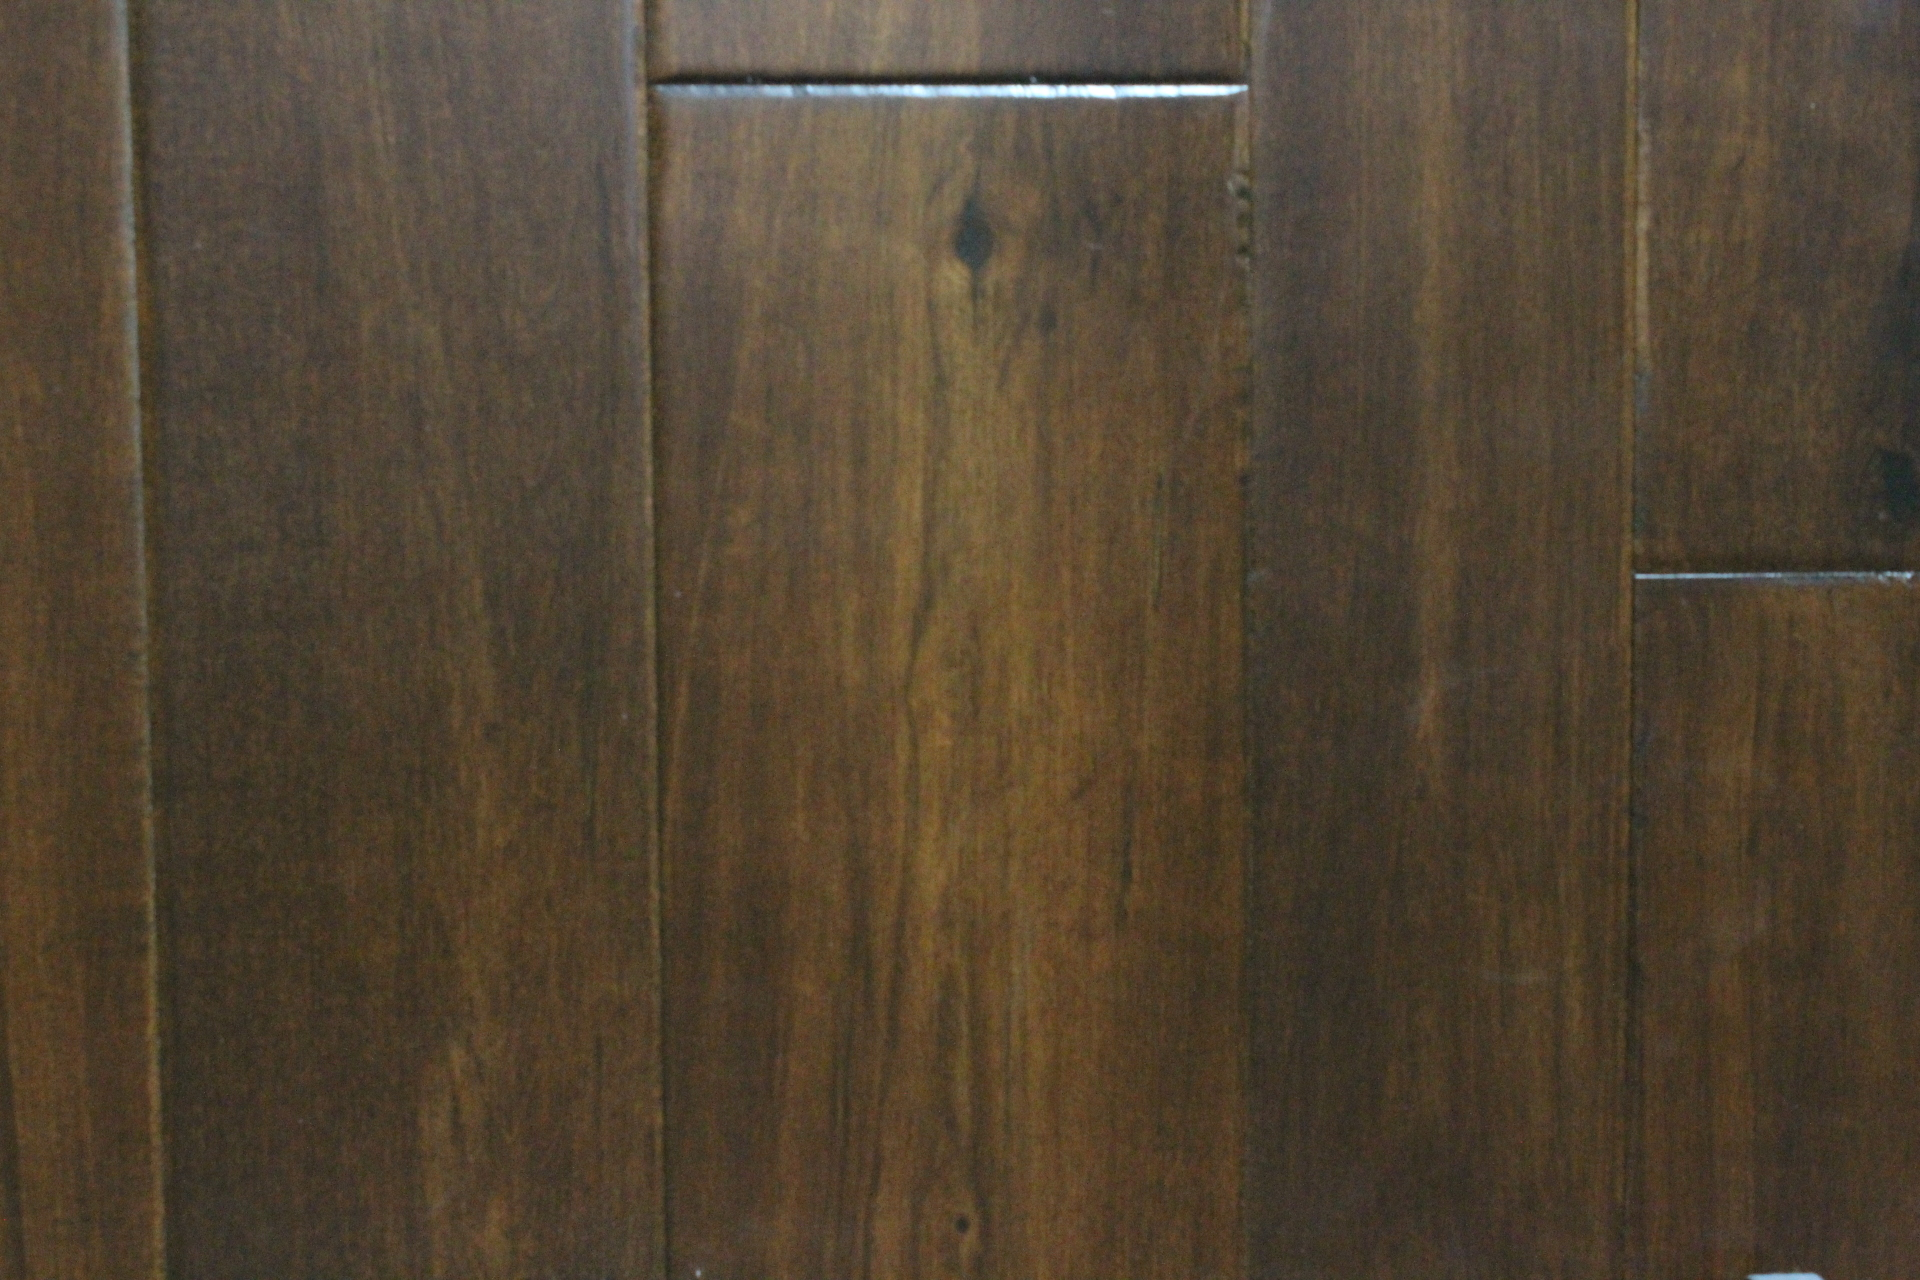 Hardwood, prefinished floor, engineered wood, solid wood, lifestyle, hard surface, prefinished hardwood, prefinished wood, home, design, interior design, wood floor design, bella cera